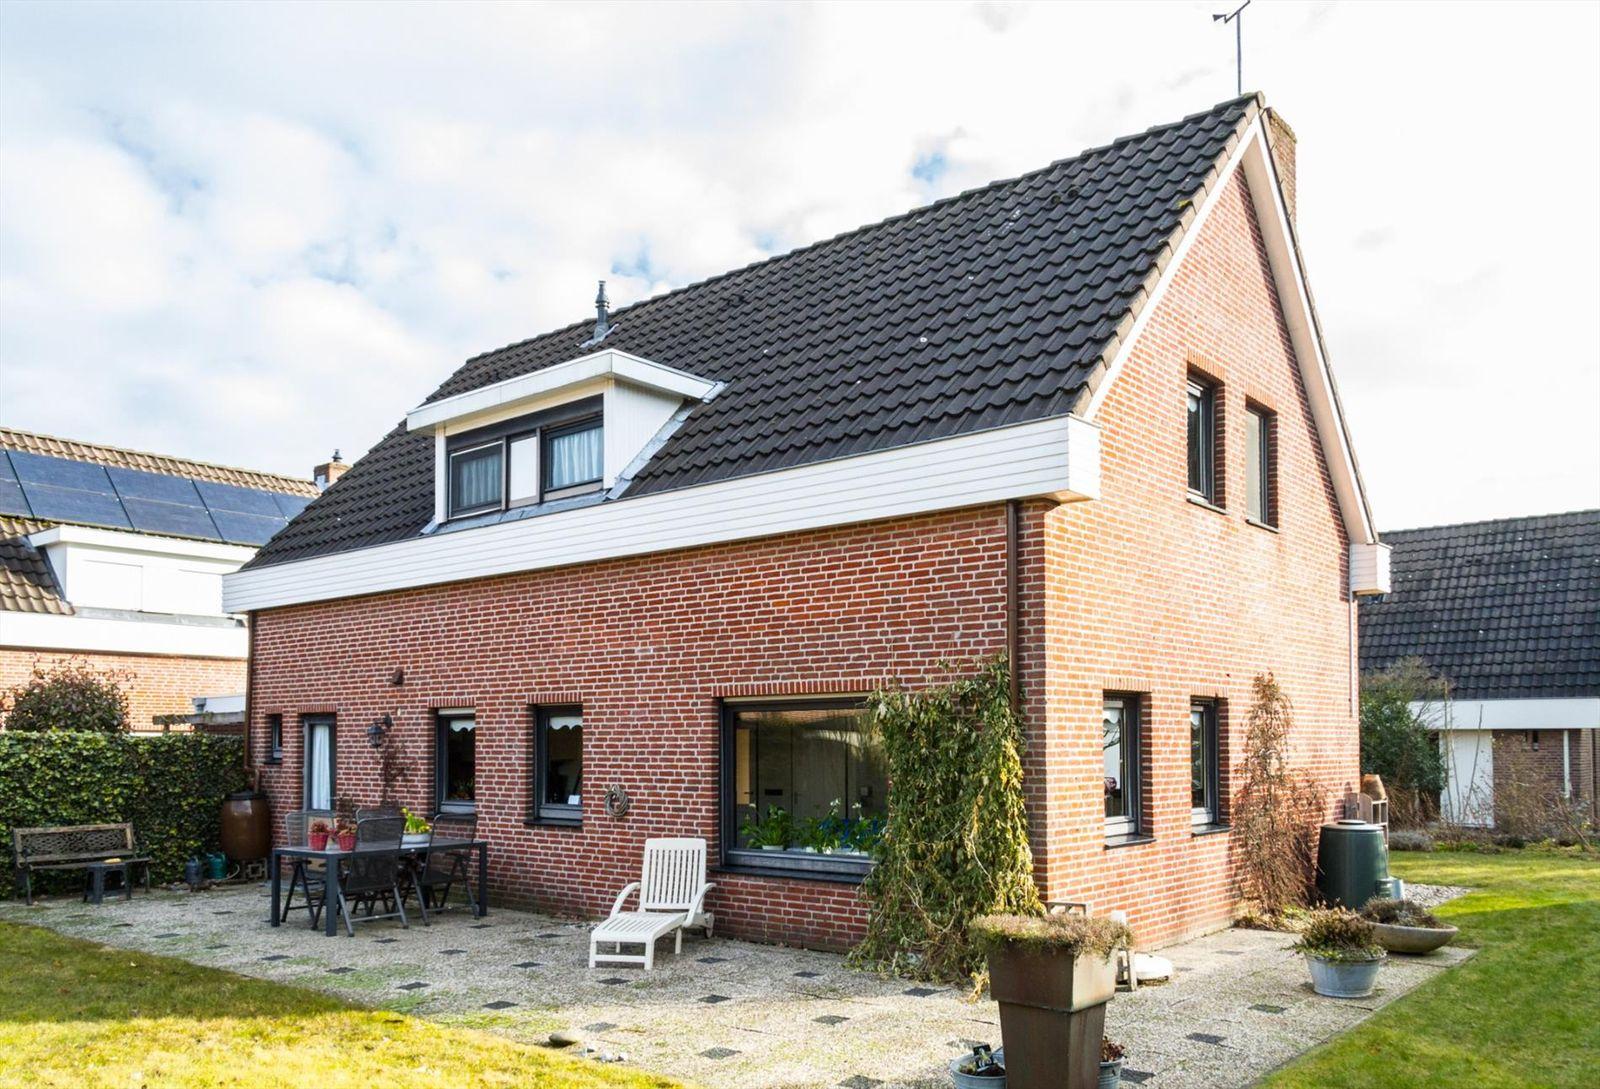 Jan Steenstraat 29, Groenlo